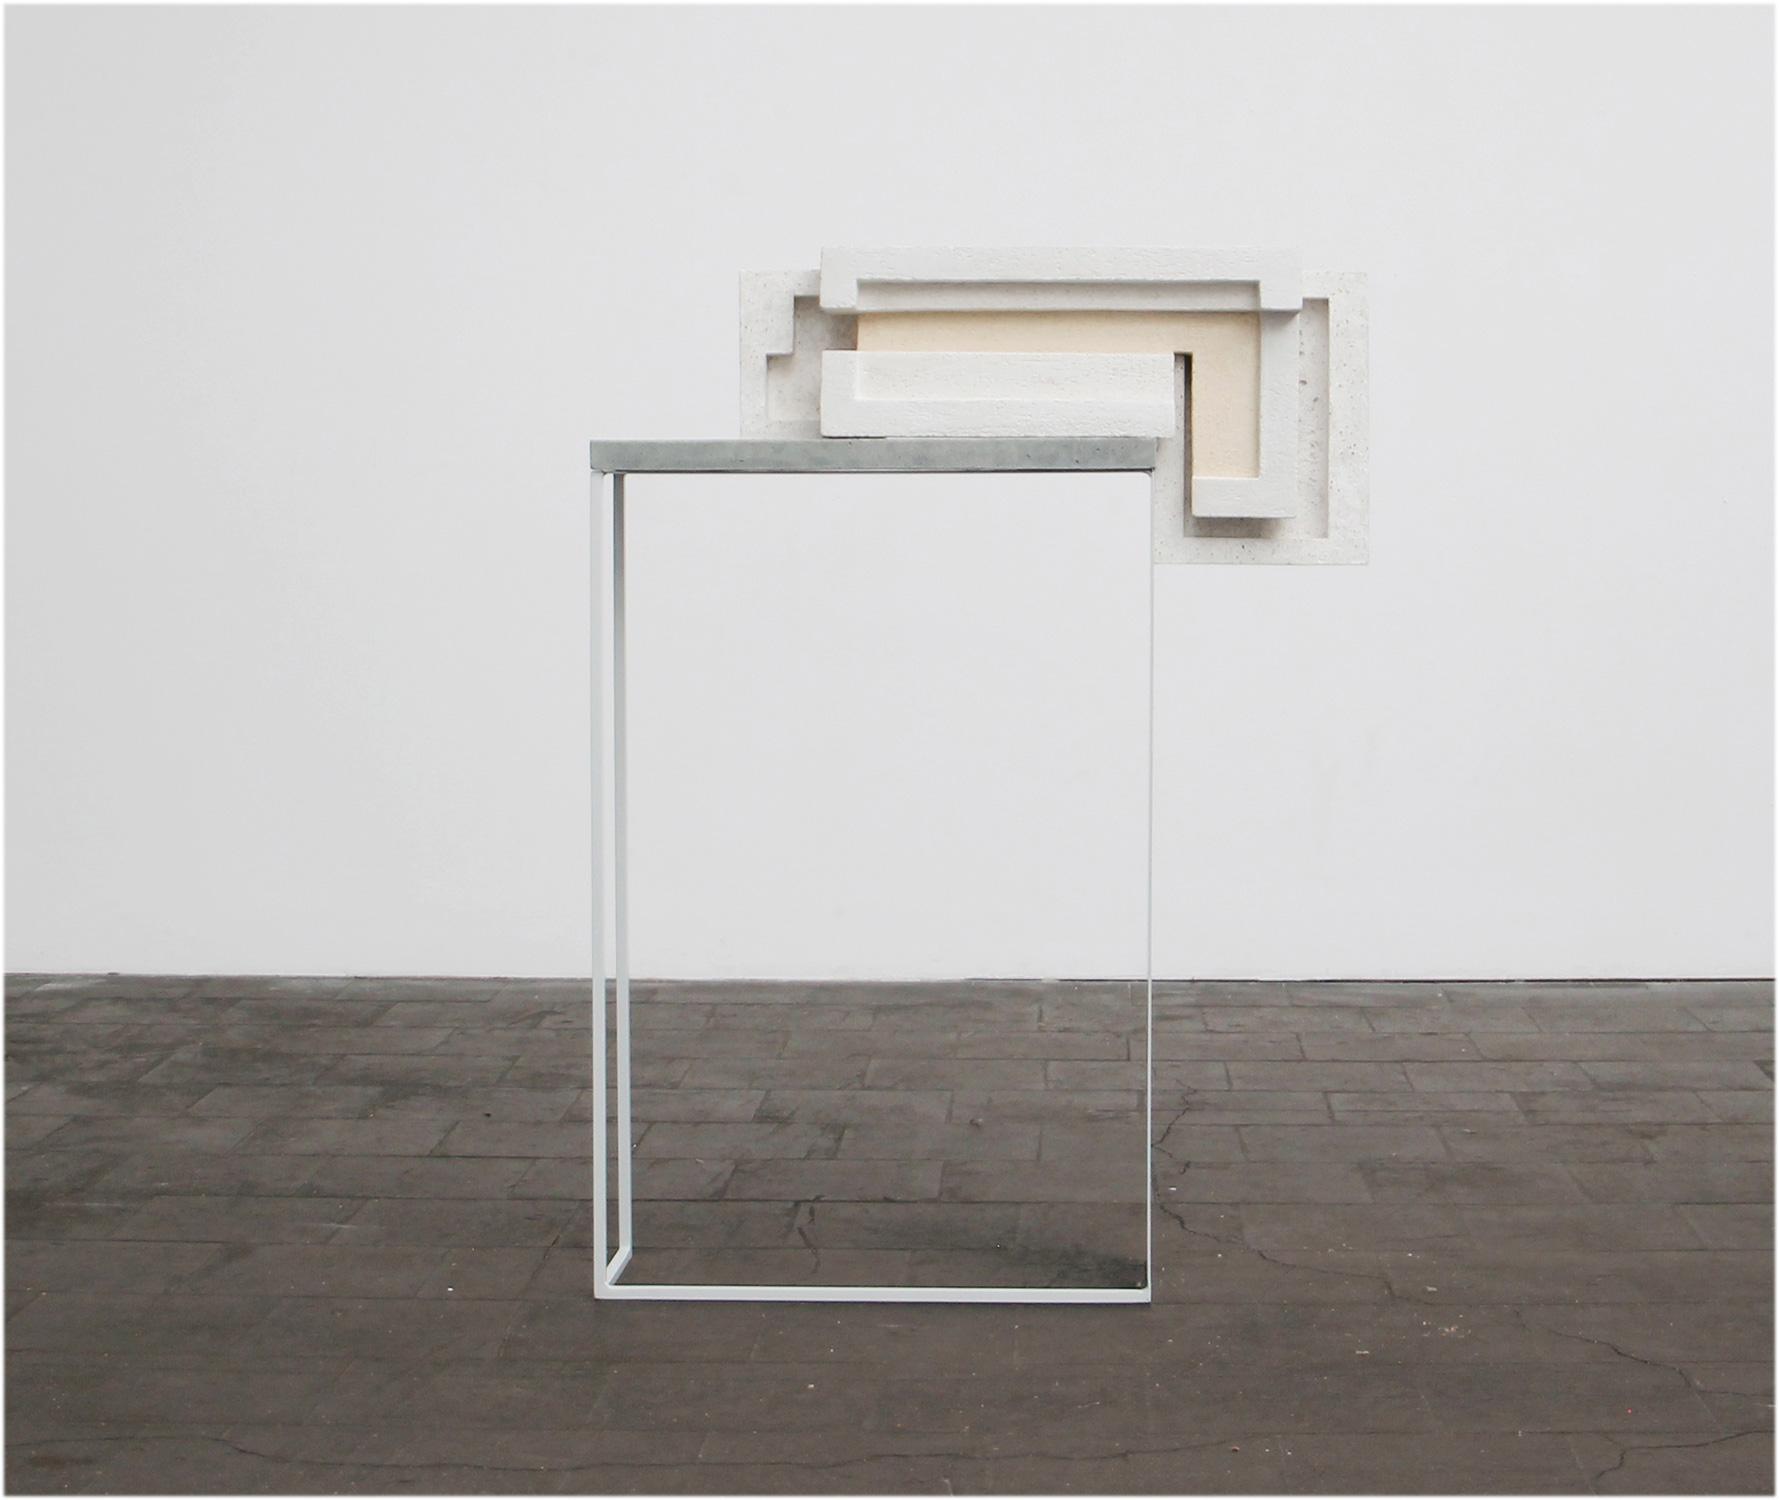 Espace|Surface 3 | 2017 | Steinzeug, Beton | 79 x 20 x 109 cm